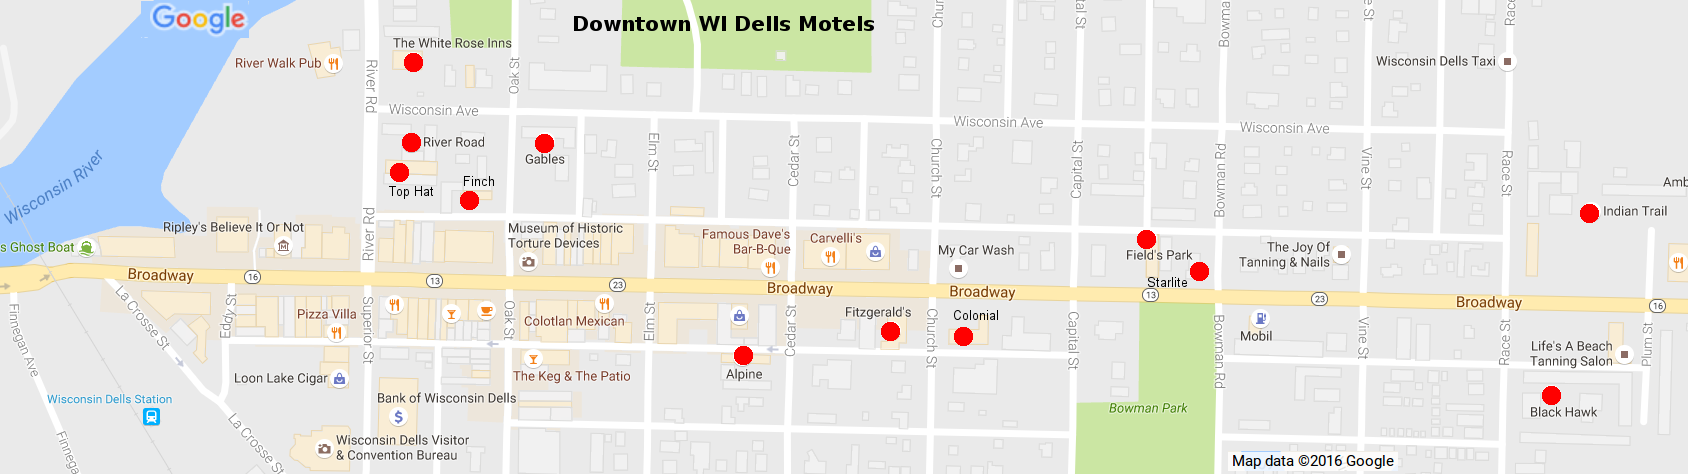 Wisconsin Dells Hotelotels